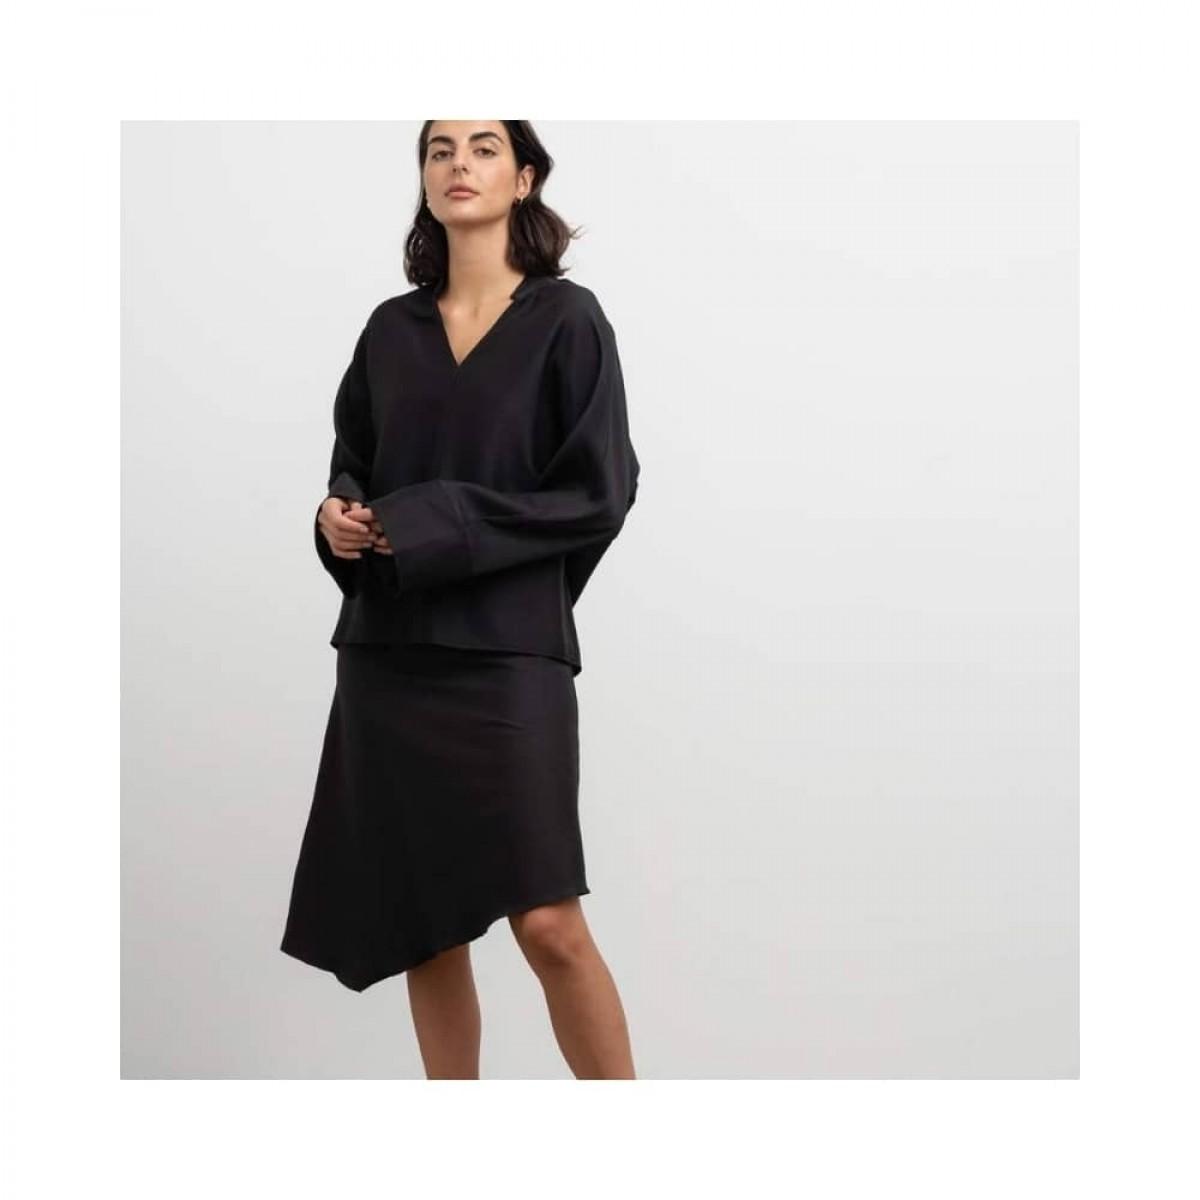 dina wool skirt - black - model detalje